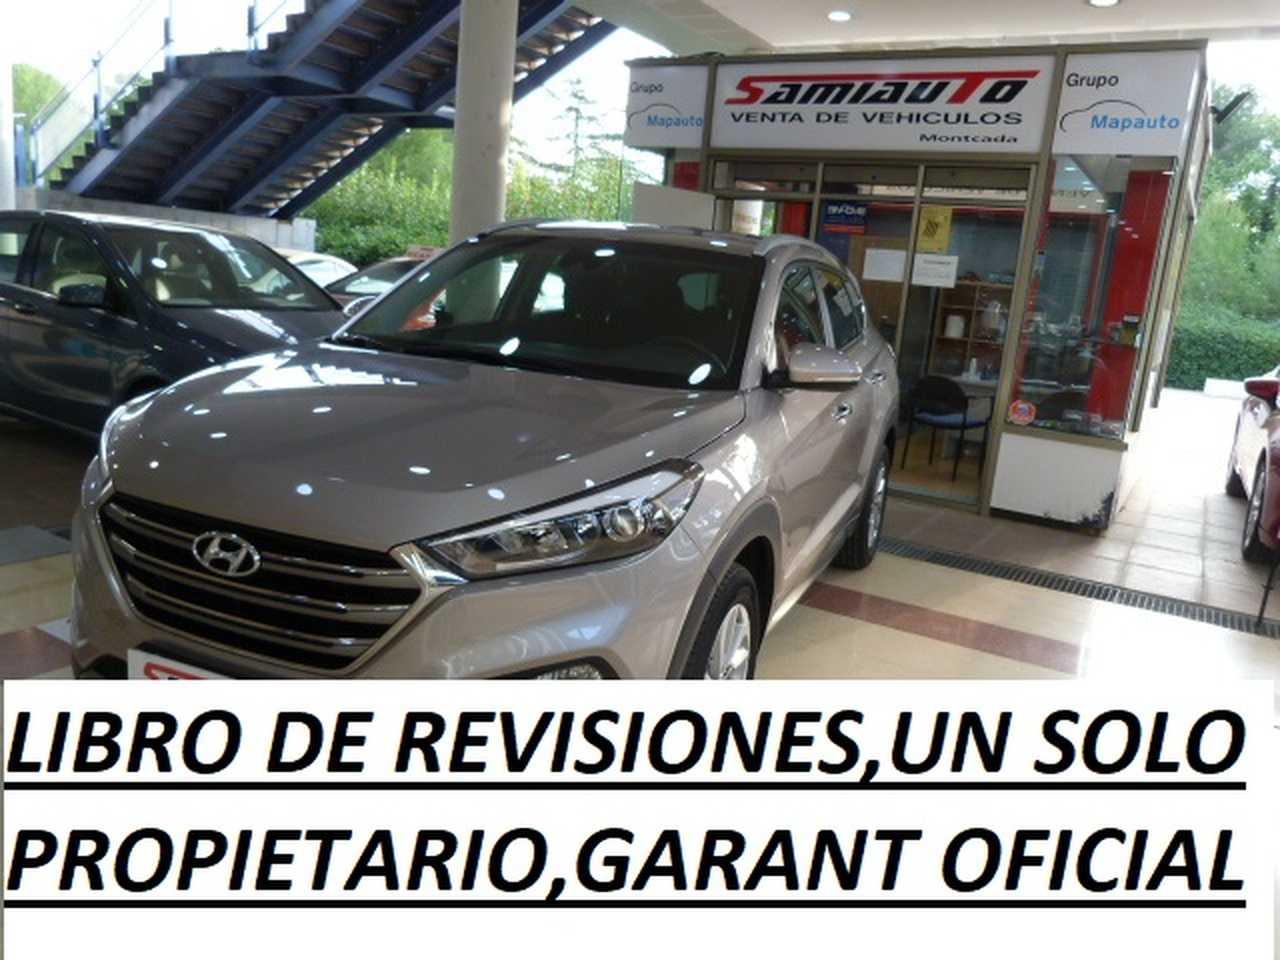 Hyundai Tucson HYUNDAI TUCSON 1.7 CRDi 141cv BlueDrive Tecno DCT 4x2 5p. un solo propietario, libro de revisiones  - Foto 1